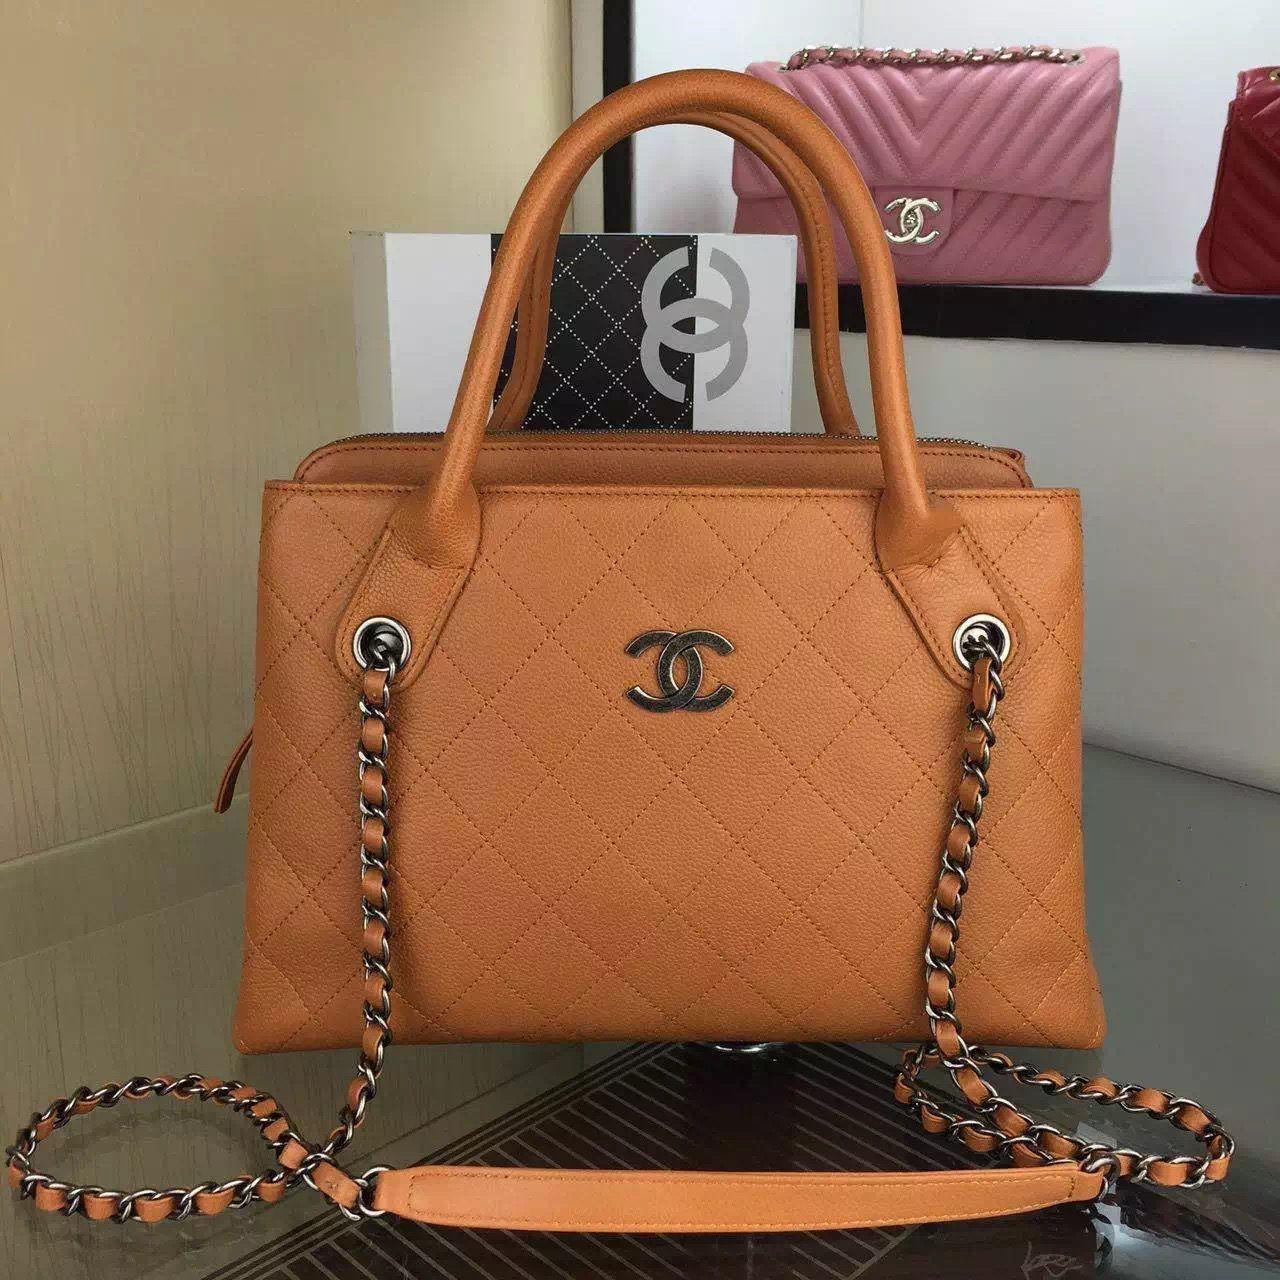 24b285569c32 Chanel Small Grained Vegetal Calfskin Shopping Bag Cruise 2016 ...